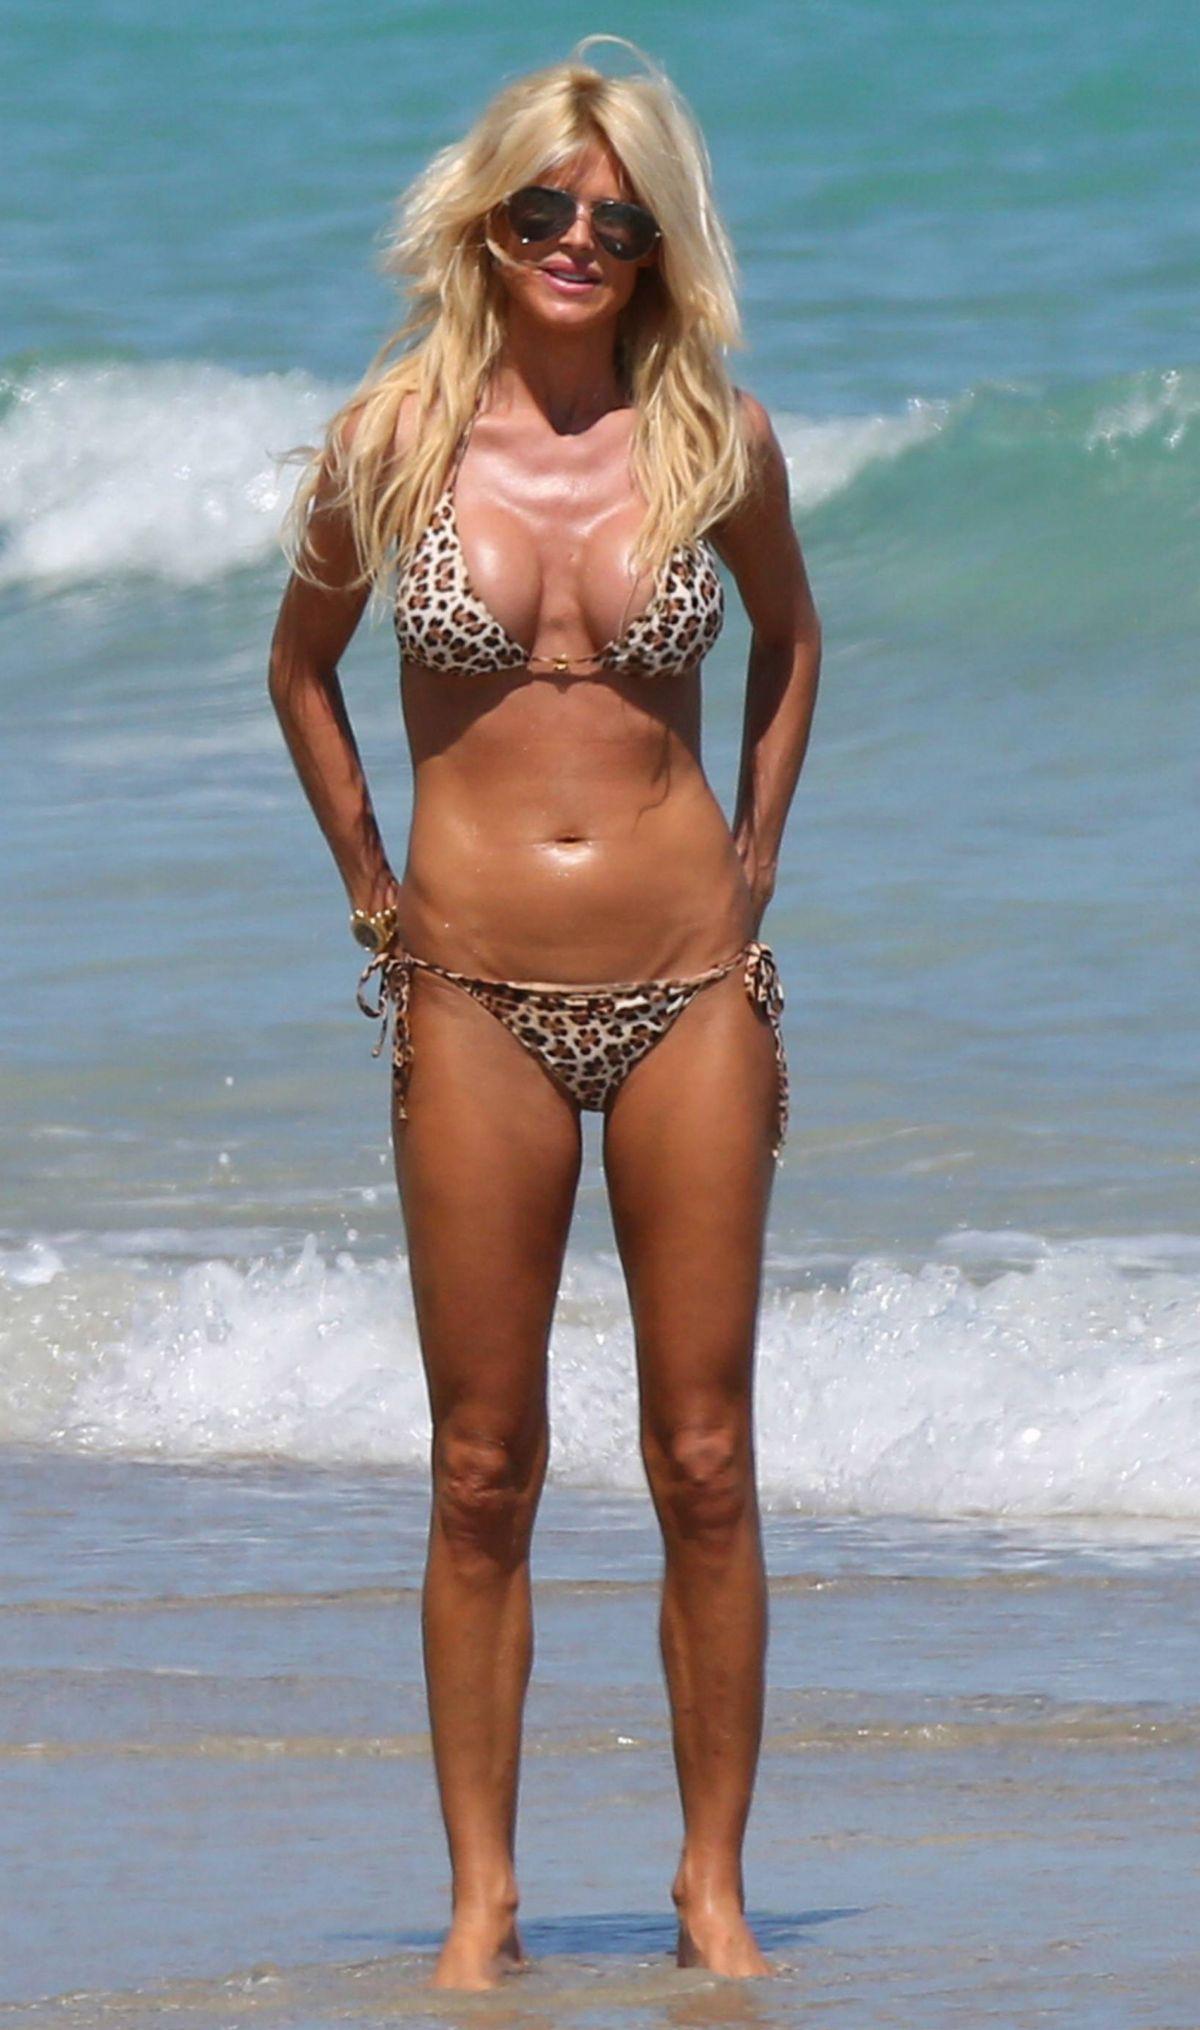 Bikini Victoria Silvstedt nude photos 2019